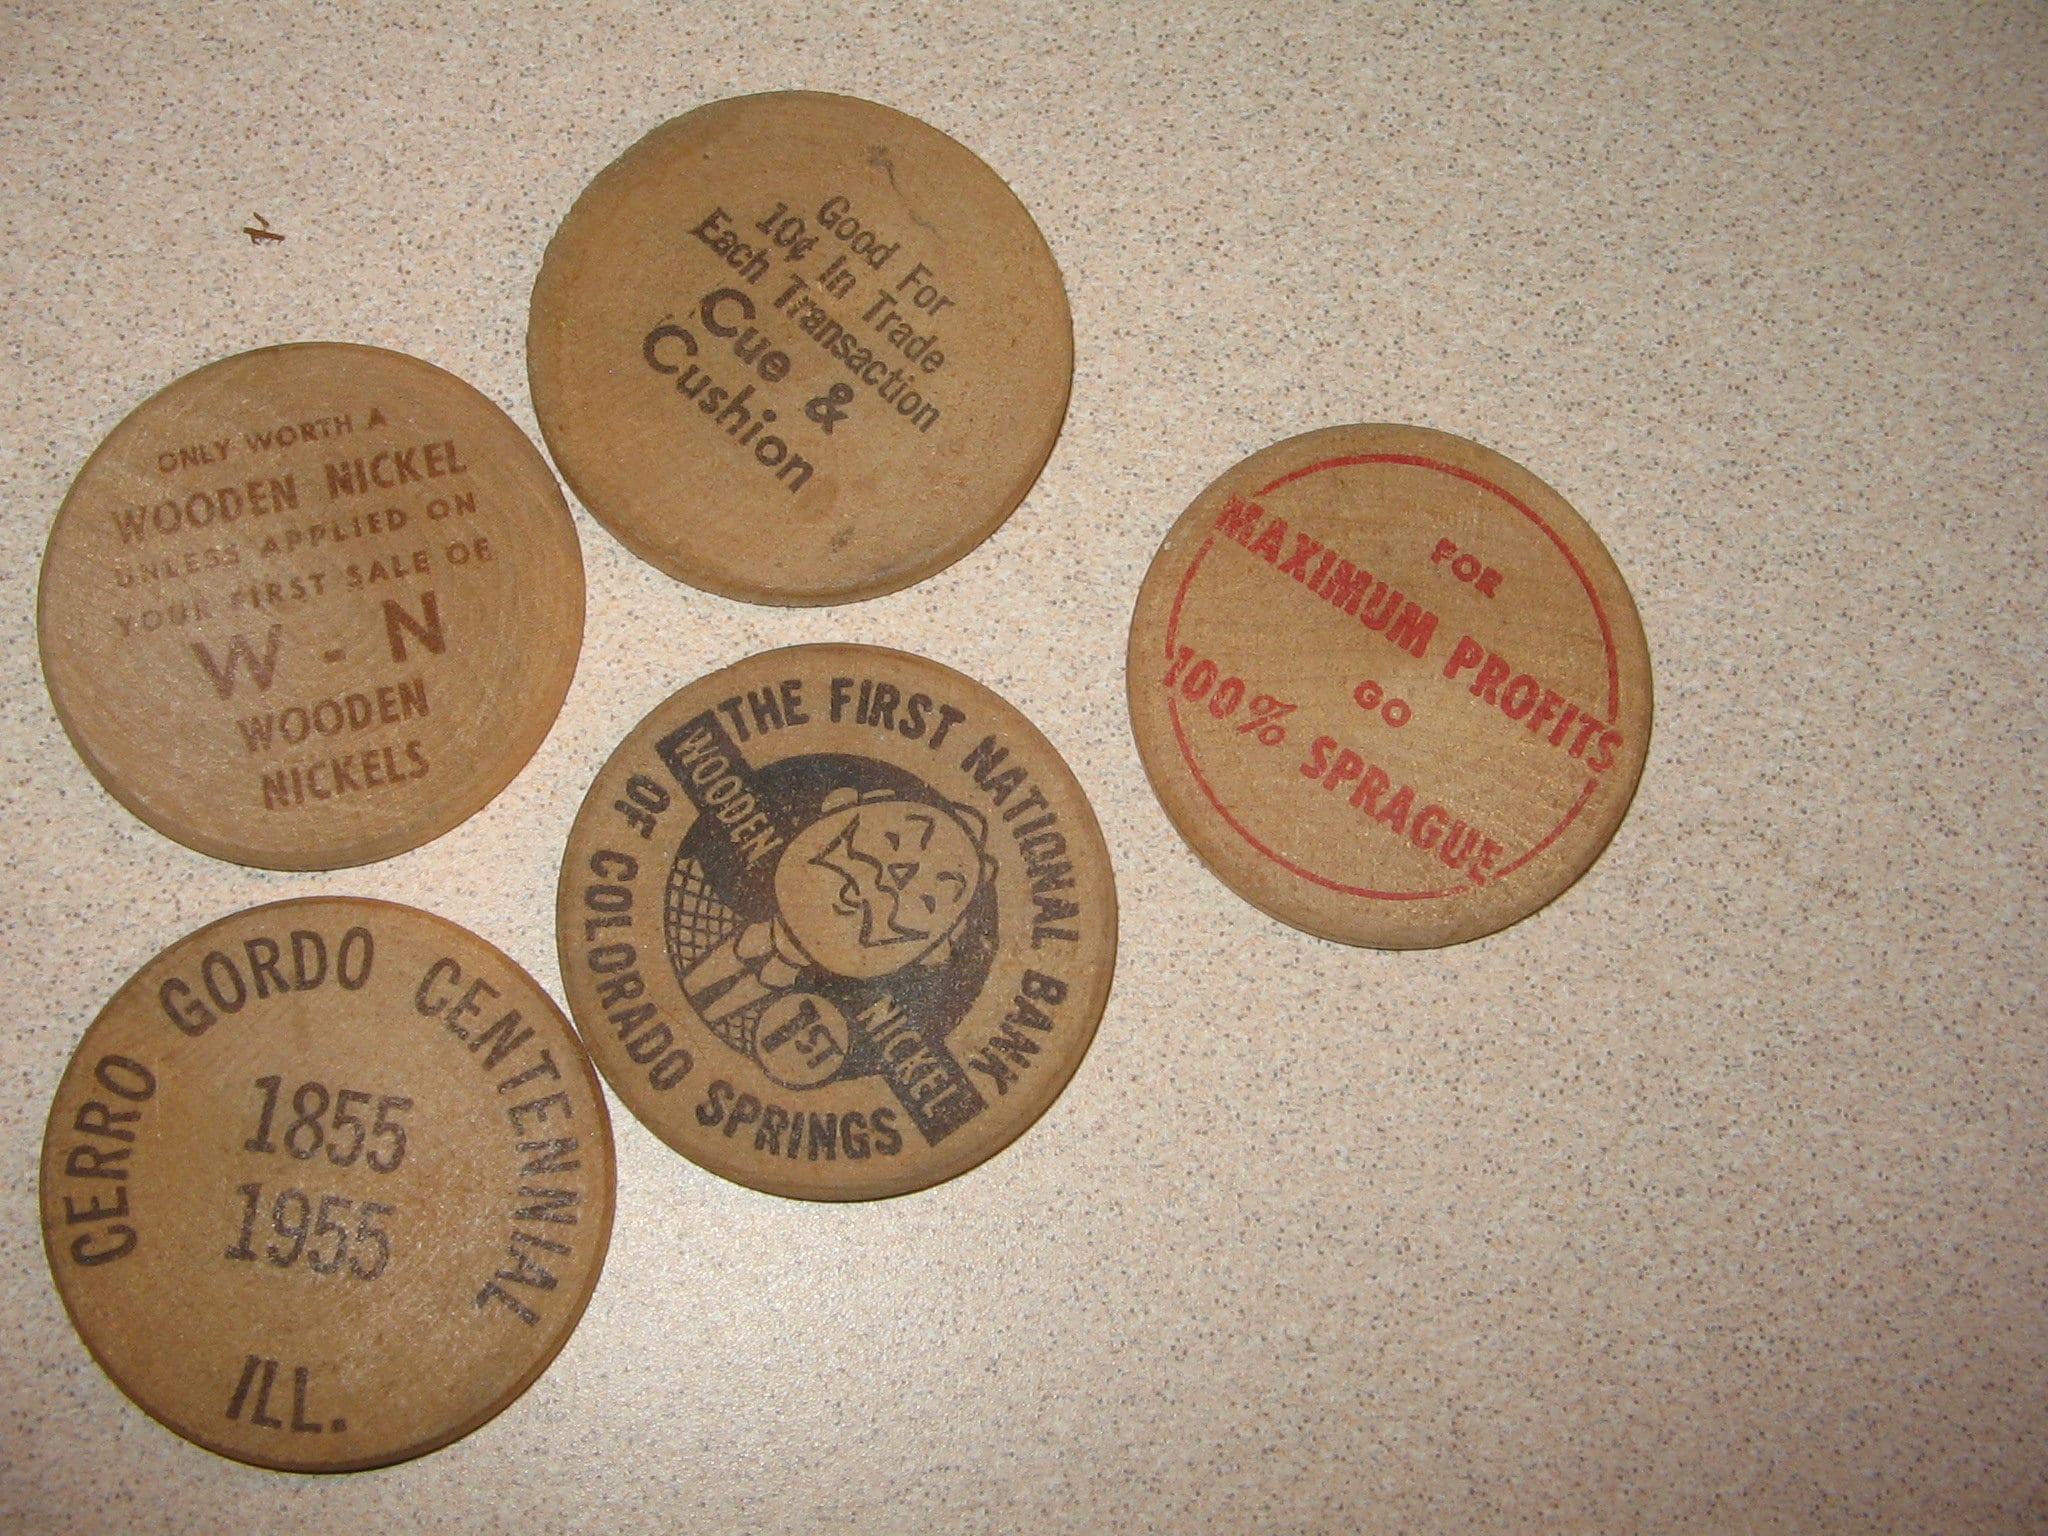 Old Wooden Nickels Illinois Colorado Coins Old Vintage Antique Collectible 13545